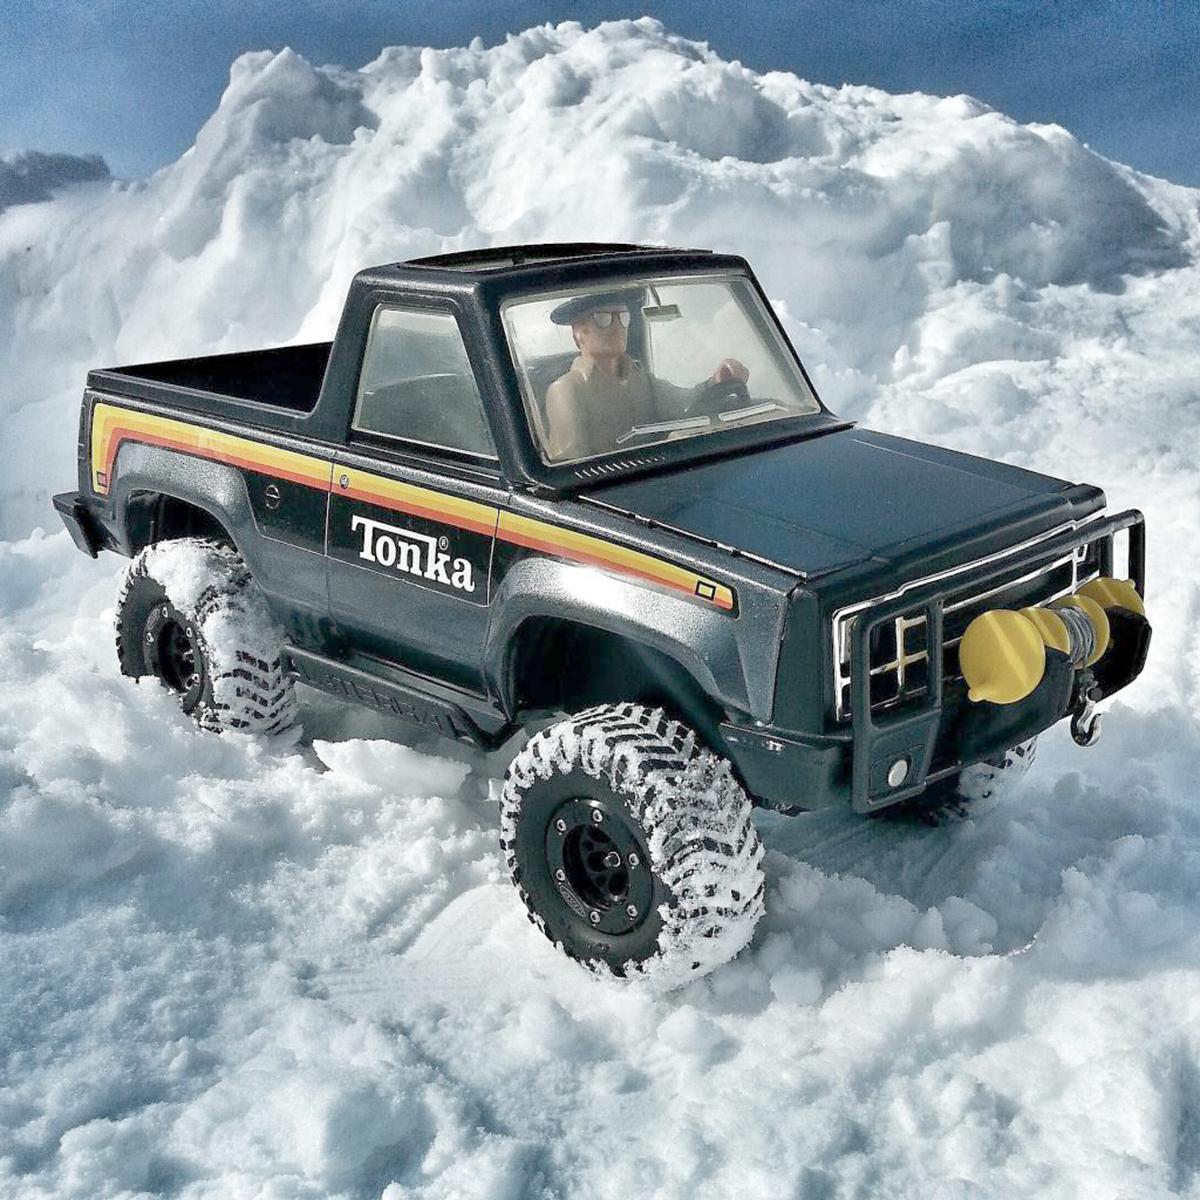 Tonka-Tough Bronco Vaterra Ascender Reader's Ride [VIDEO]